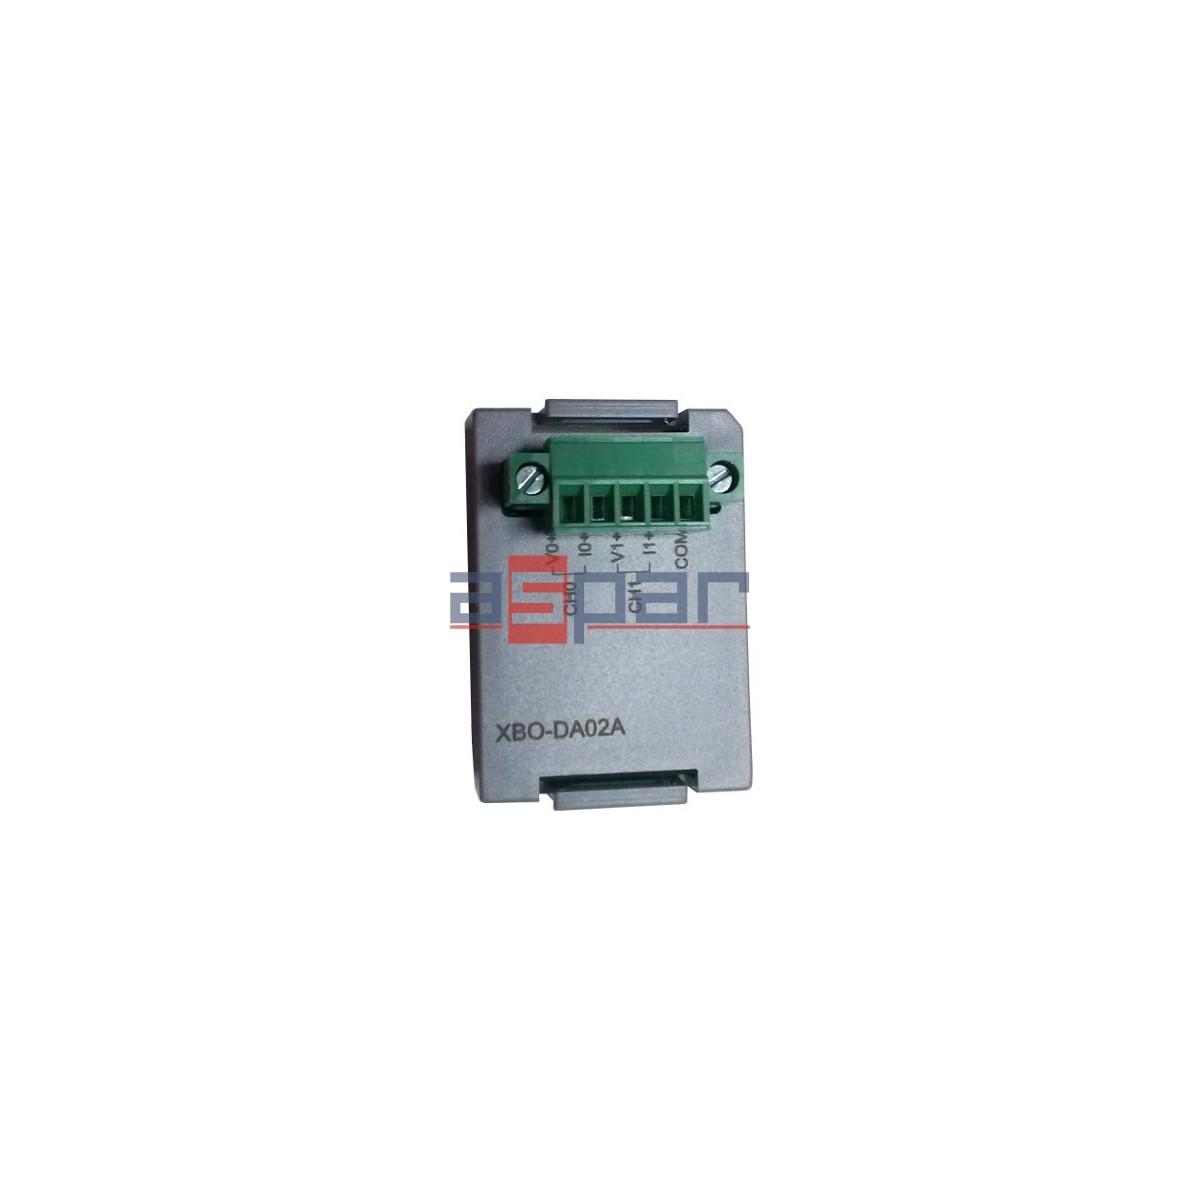 XBO-DA02A - 2 analogue outputs